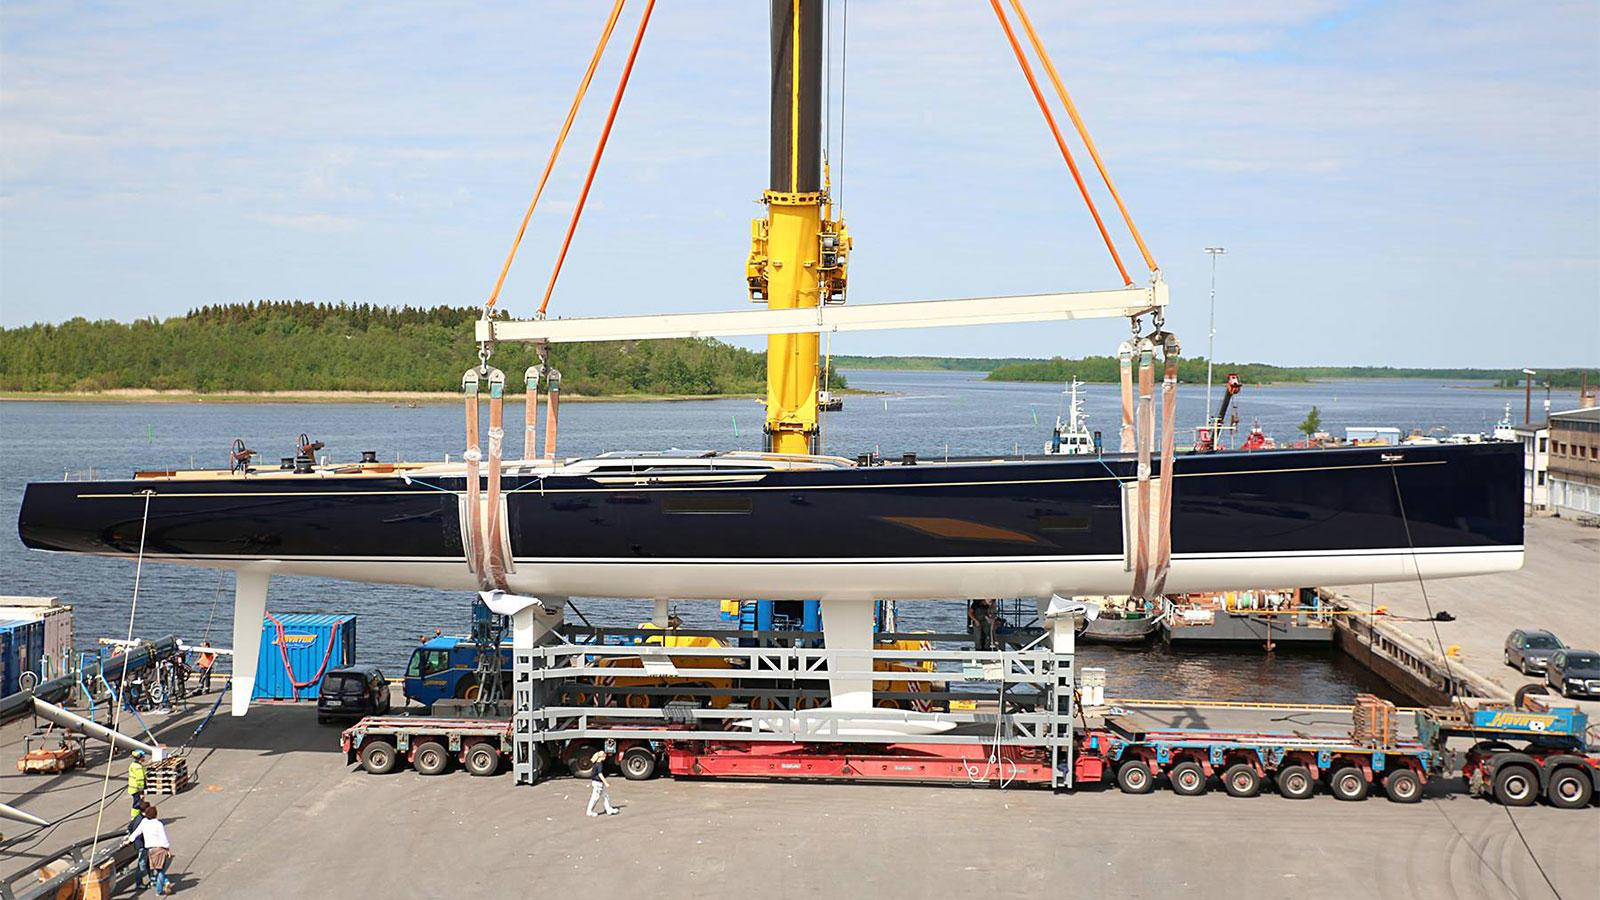 baltic-130-sailing-yacht-2016-40m-profile-shipyard